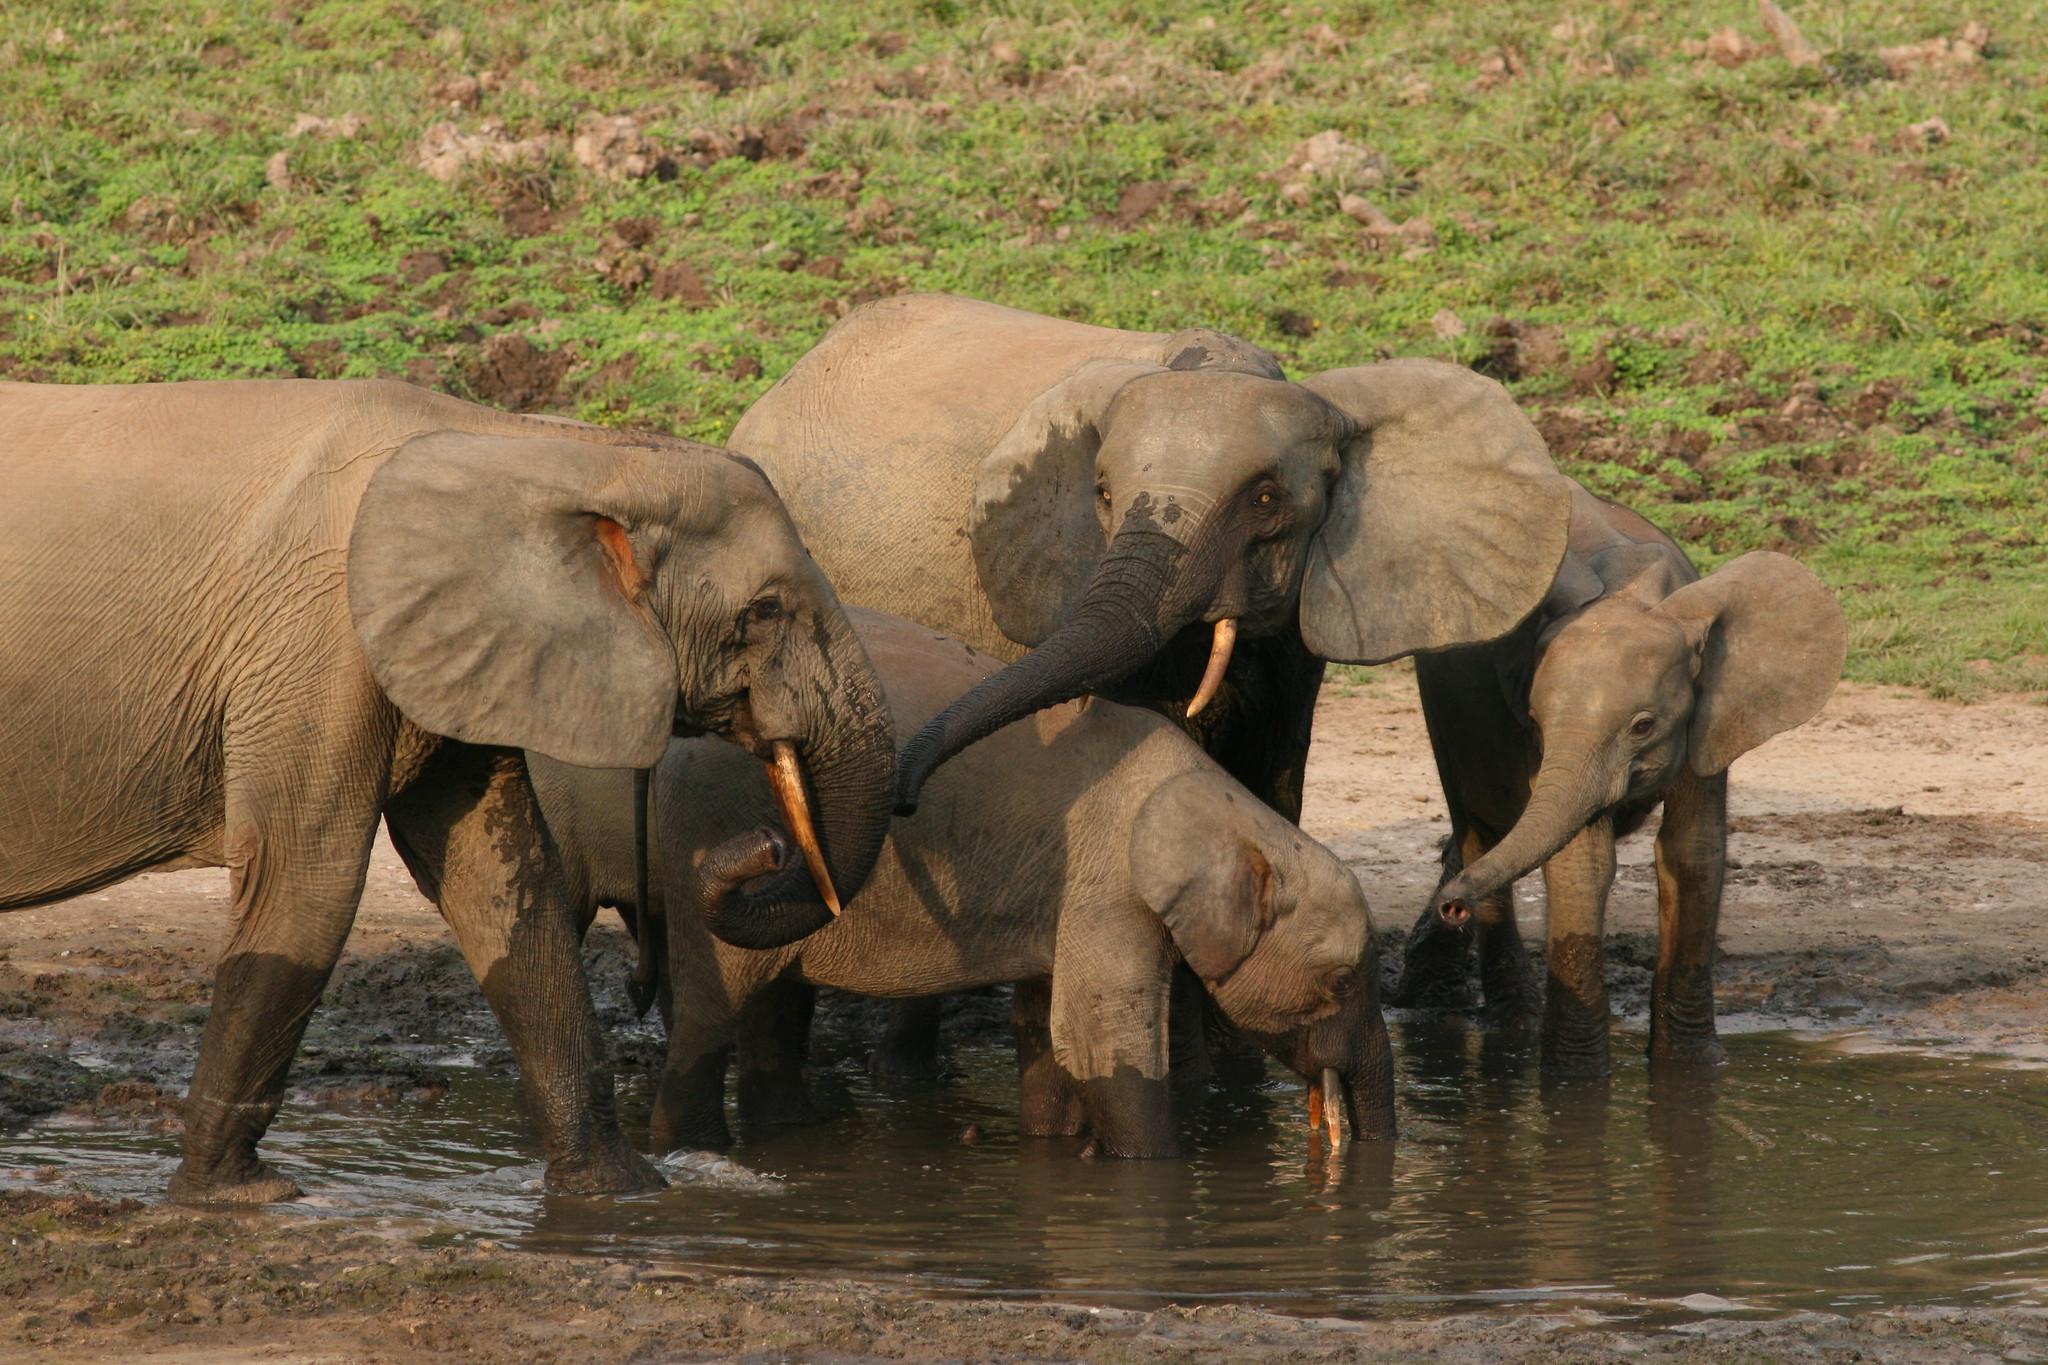 Foresst elephants